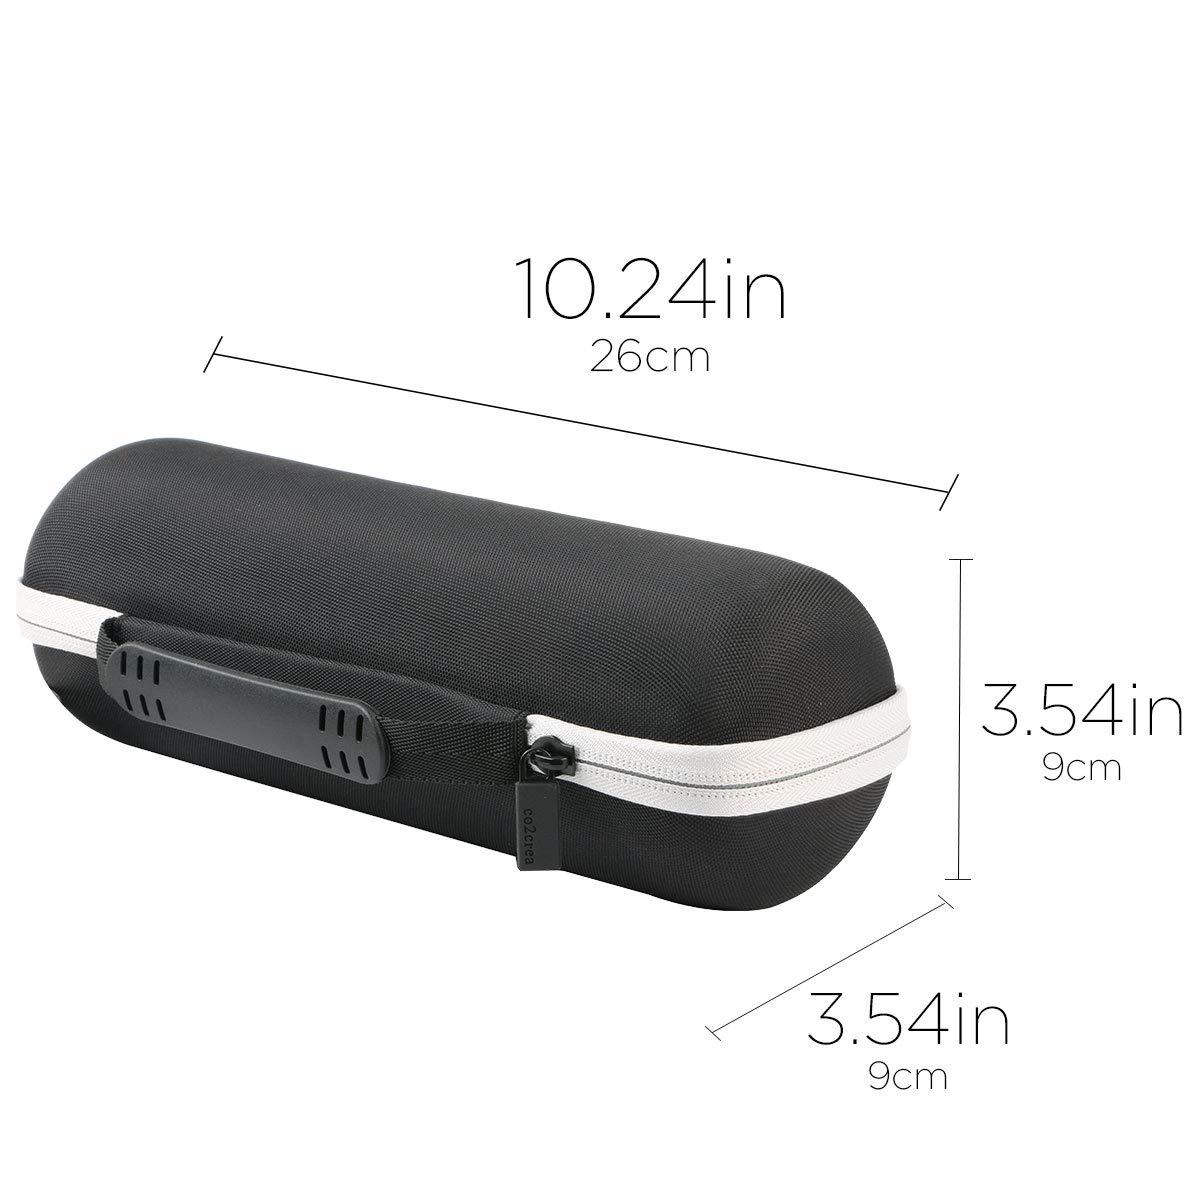 Black Case + Inside Blue co2crea Hard Travel Case Replacement for JBL FLIP 5 Waterproof Portable Bluetooth Speaker